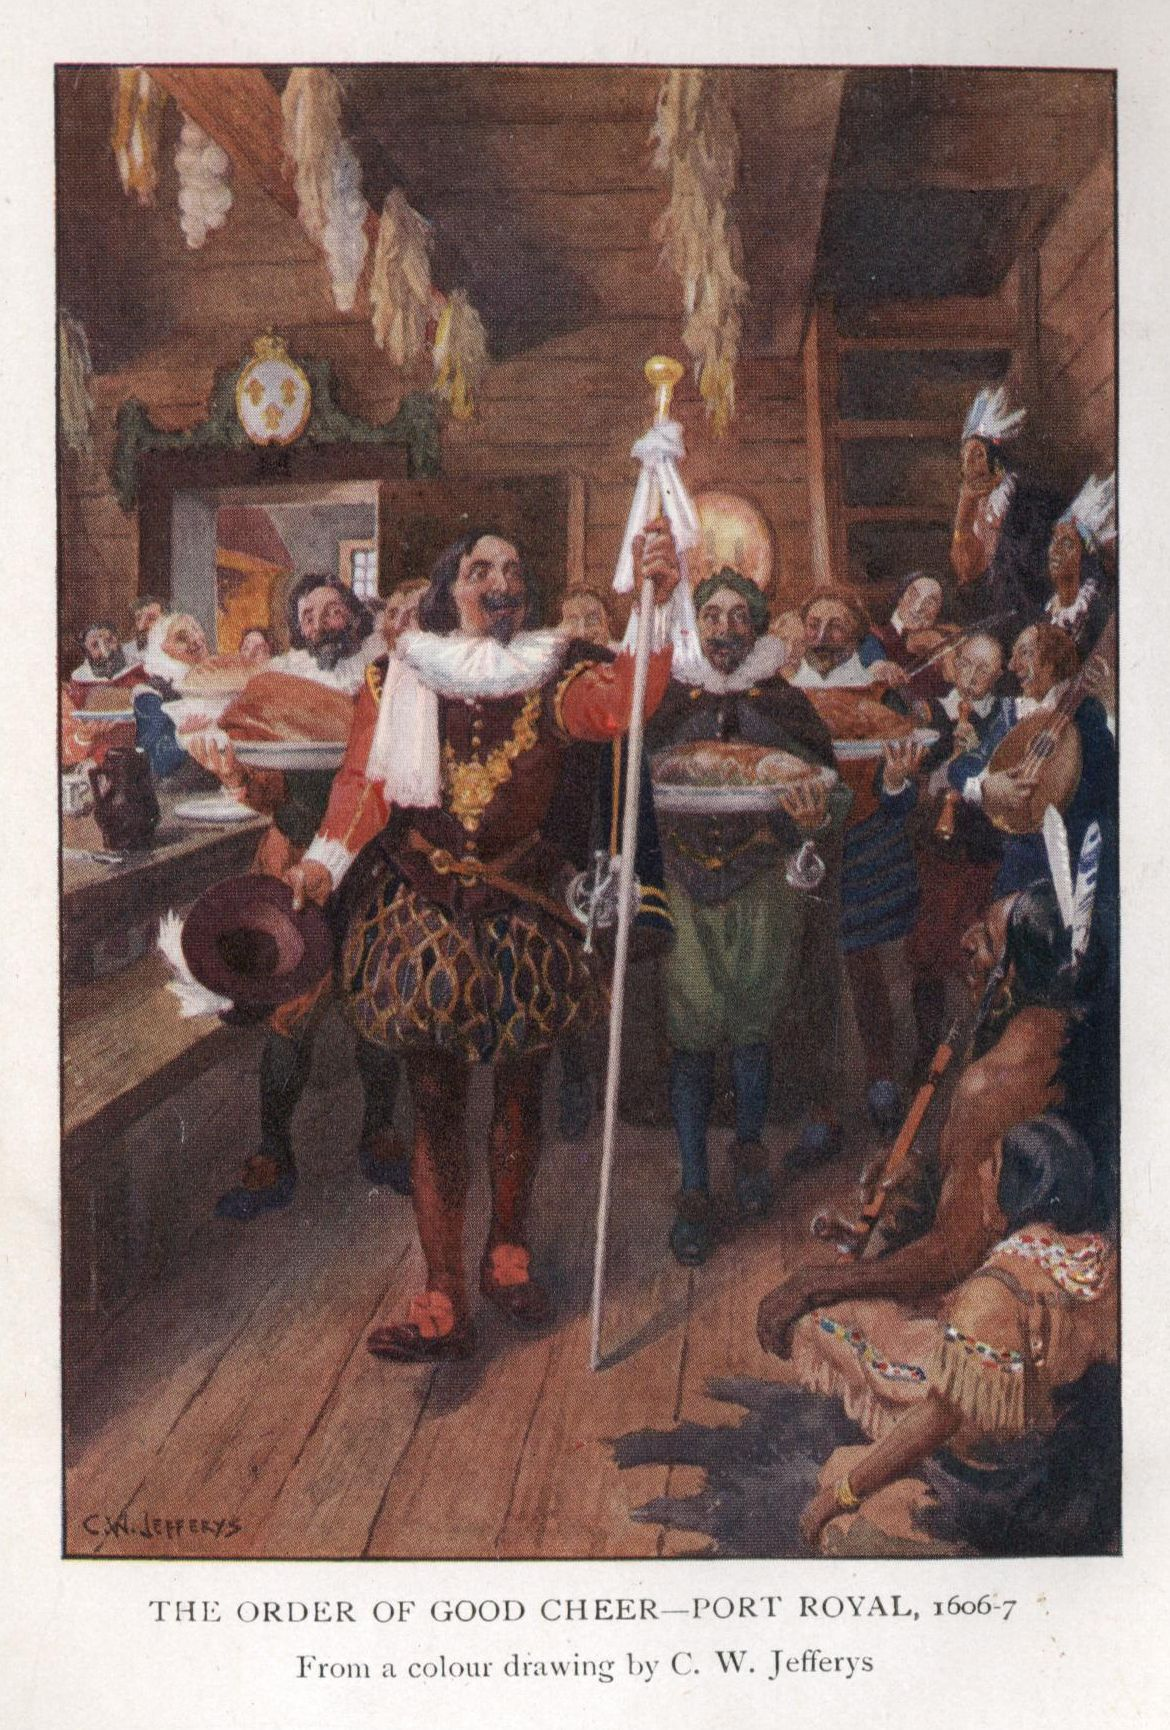 THE ORDER OF GOOD CHEER PORT ROYAL 1606 7